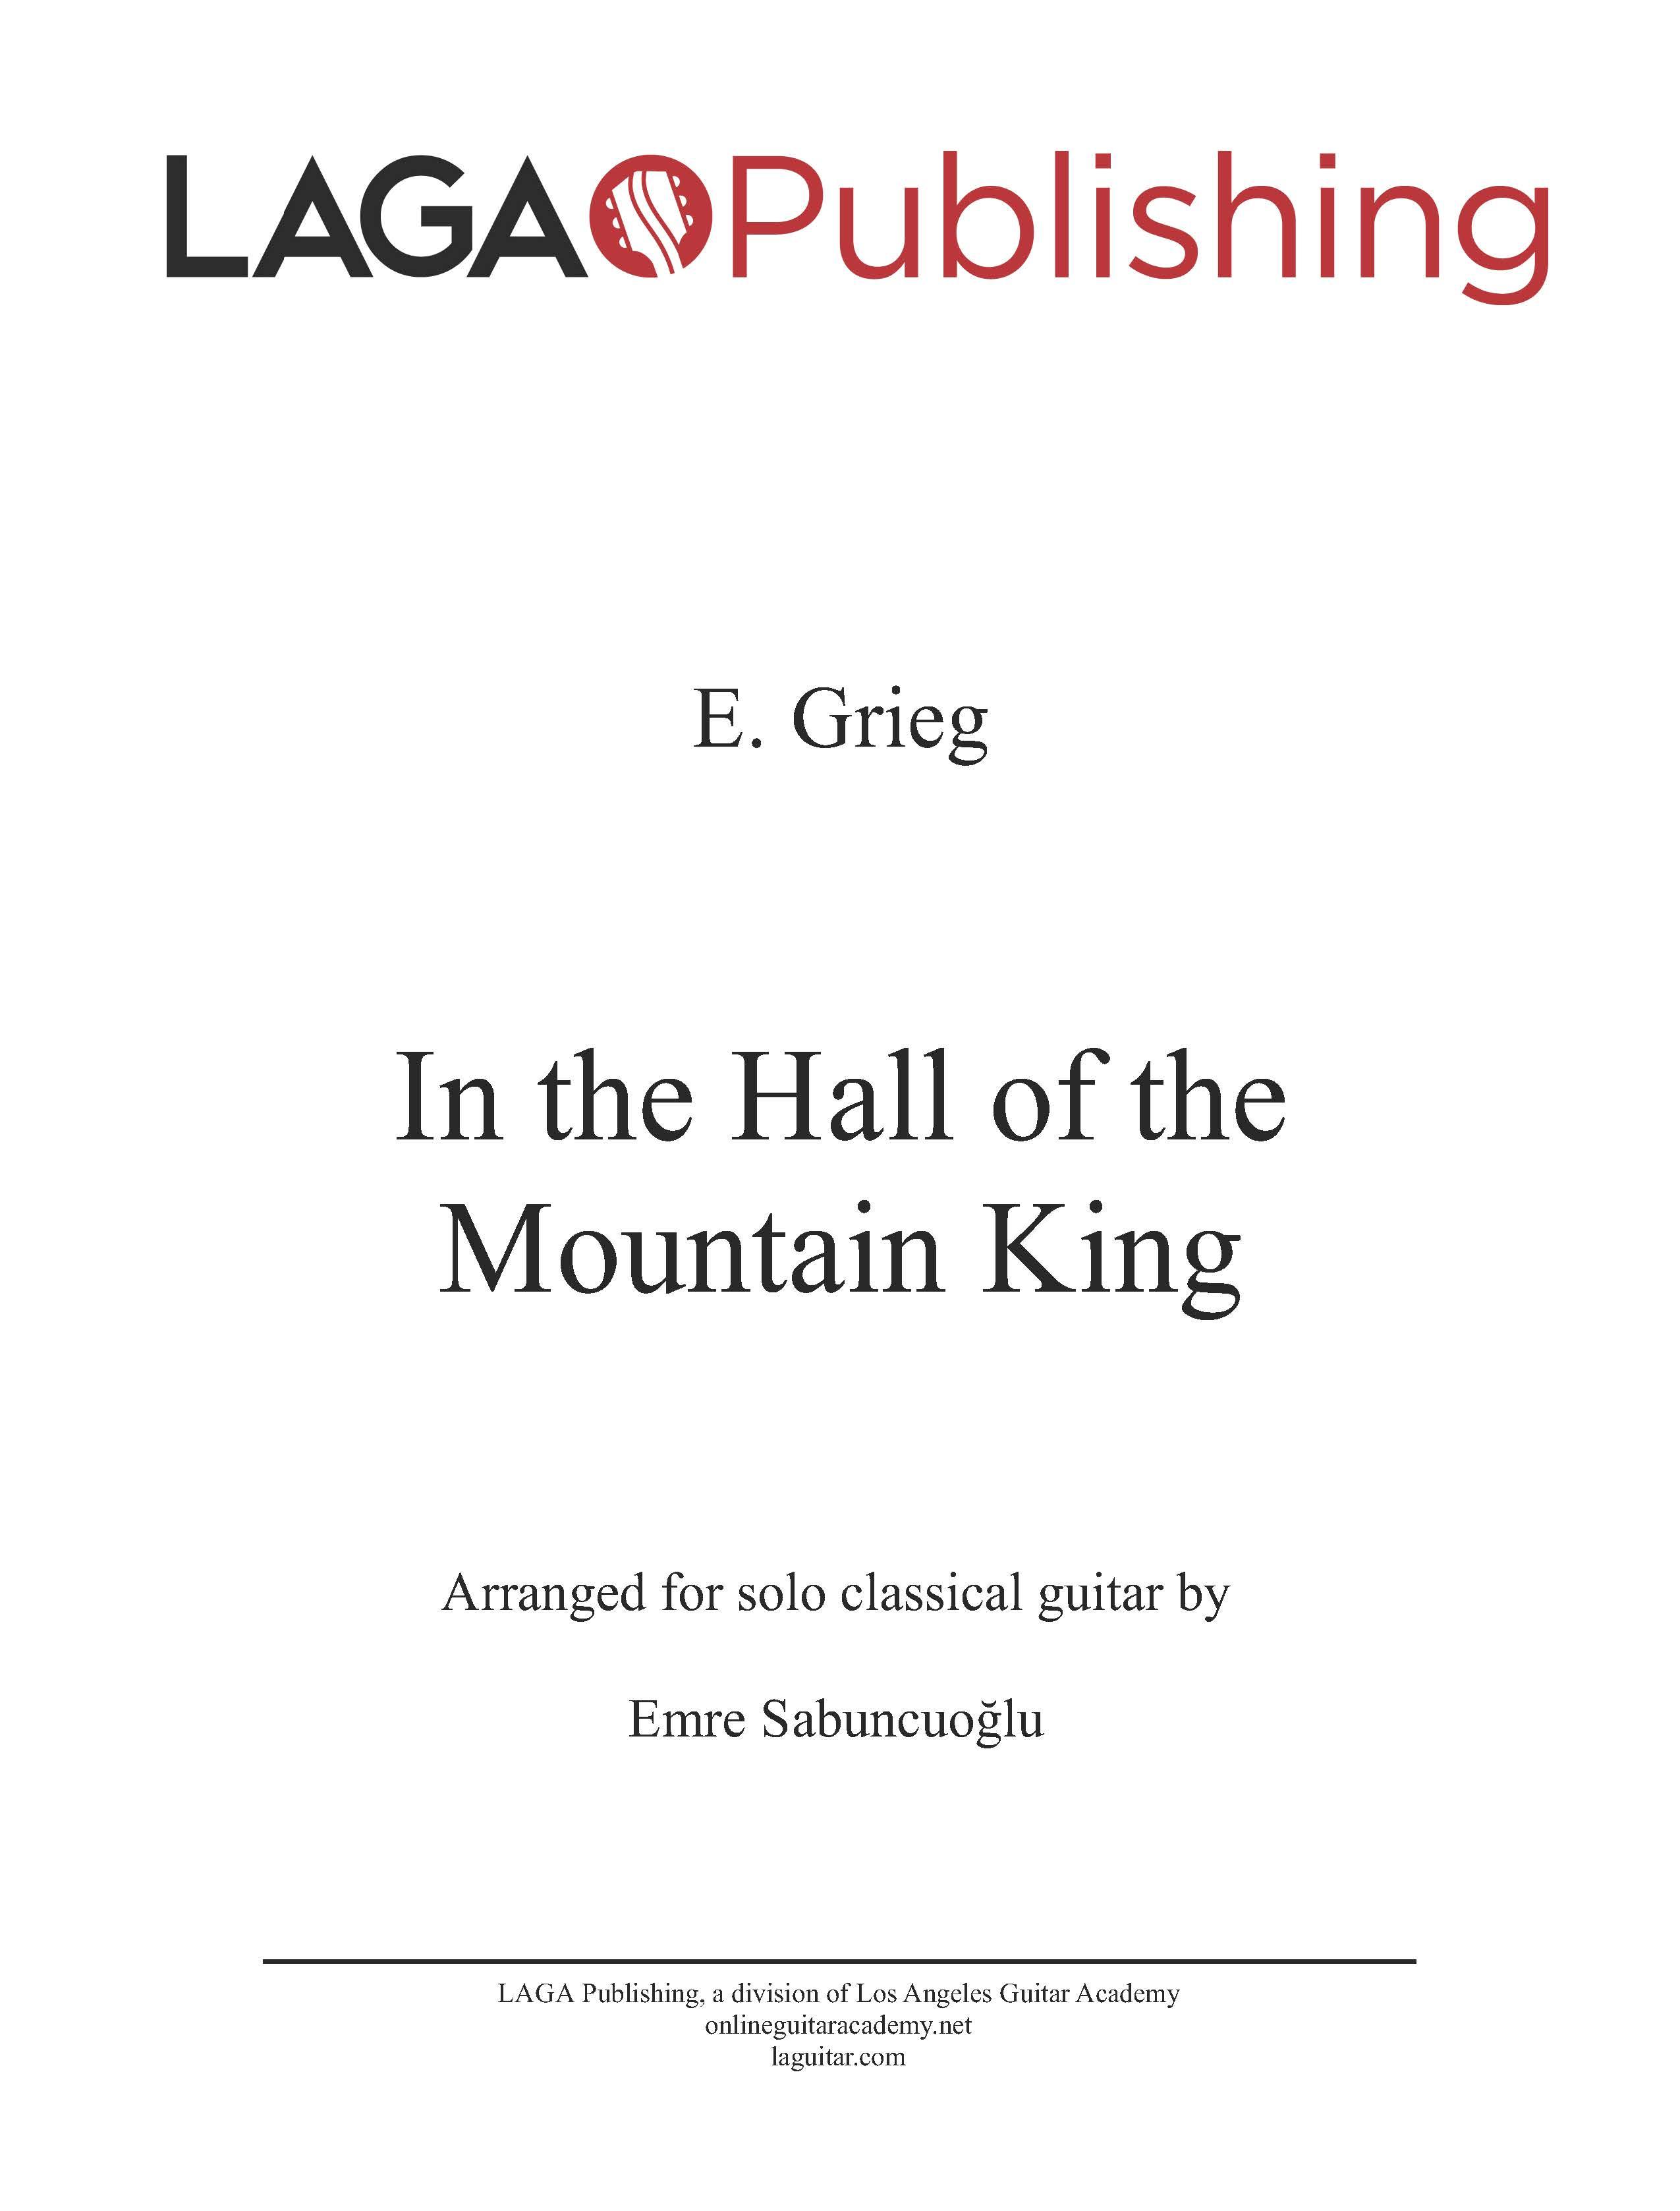 LAGA-Publishing-Grieg-Mountain-King-Score-and-Tab